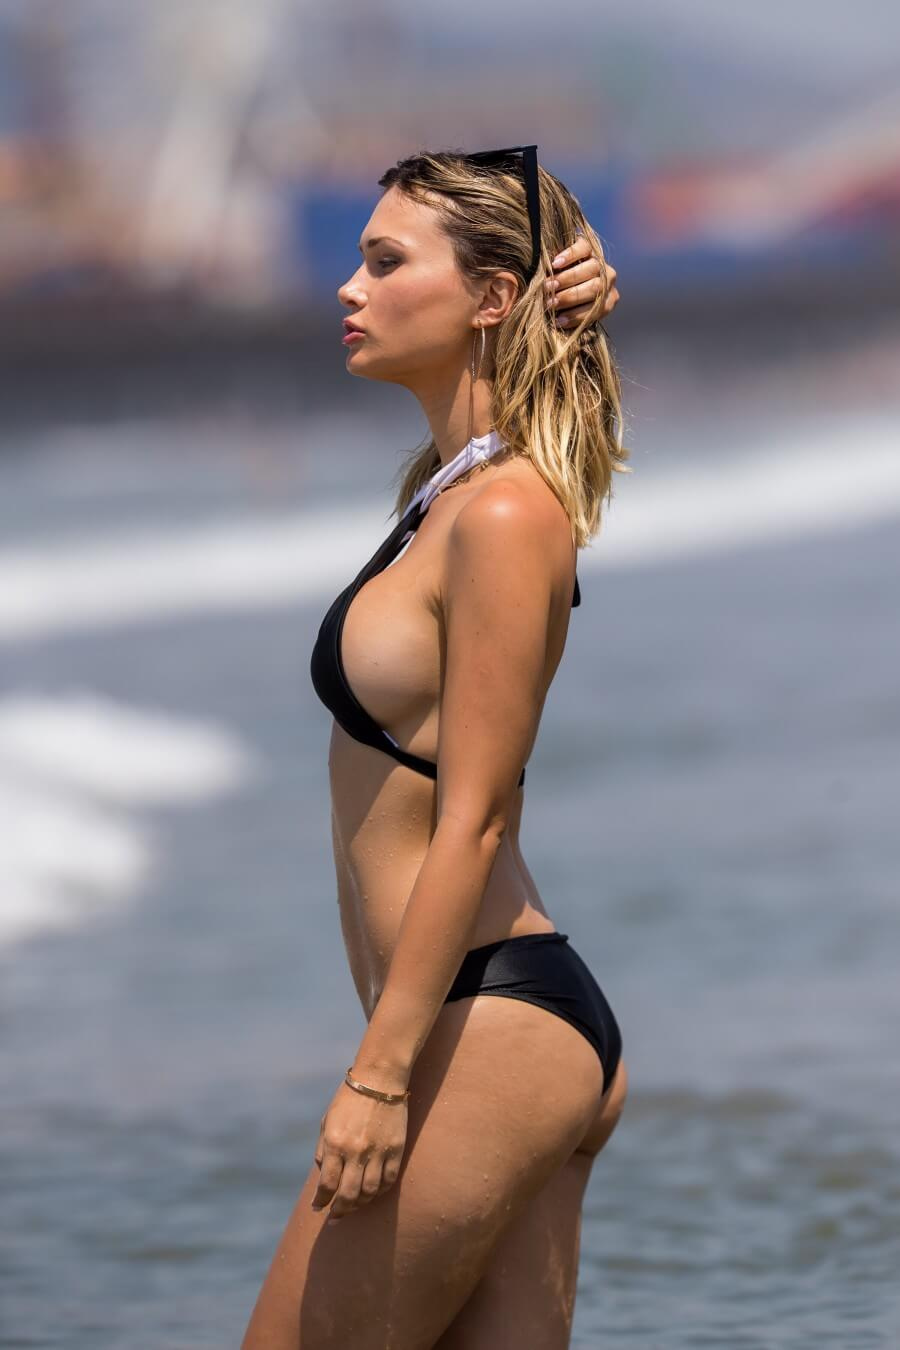 Ella Rose bikini babe